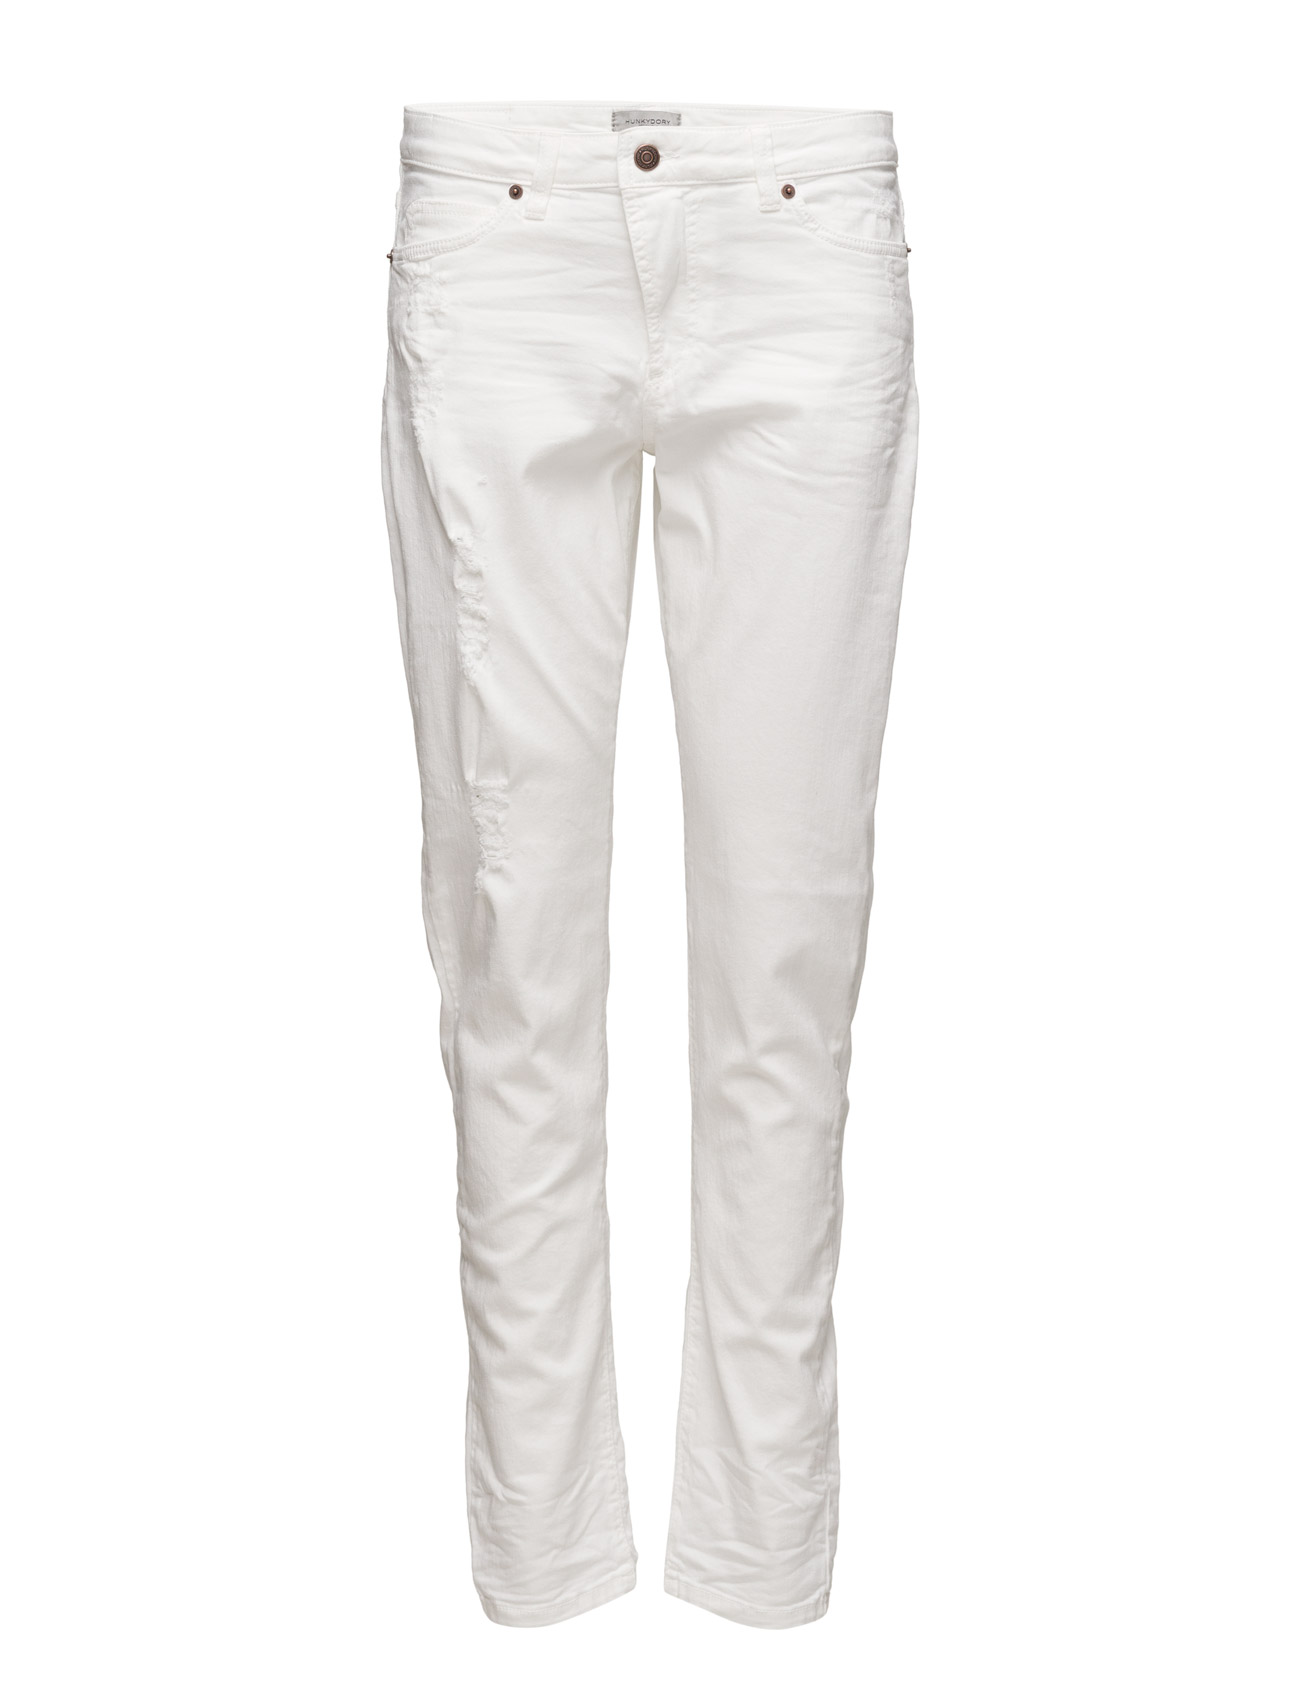 Piccola Jeans Hunkydory Jeans til Damer i